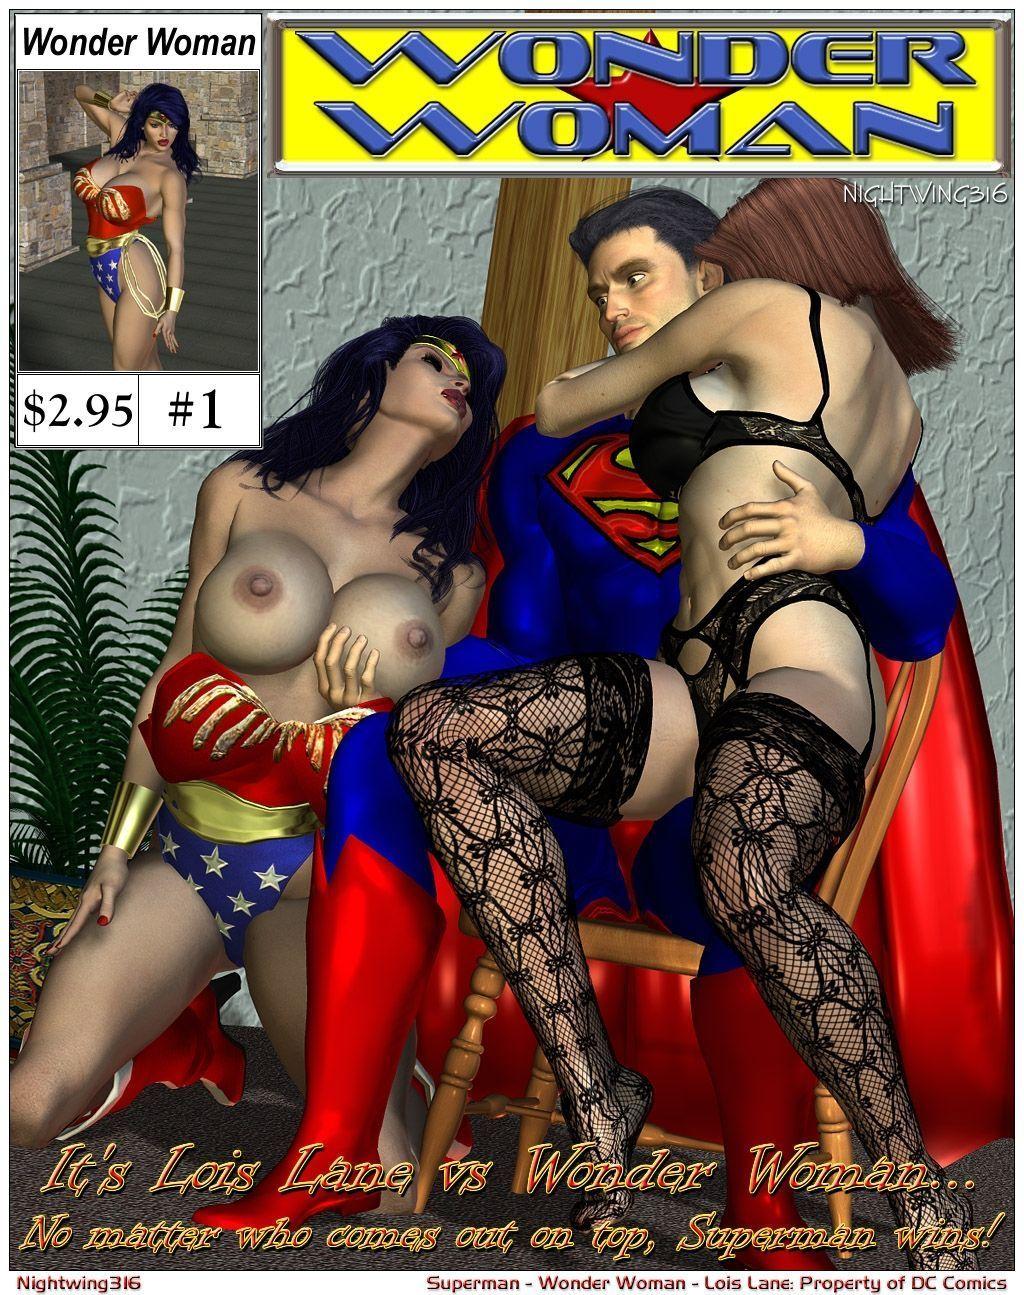 [Nightwing316] Lois Lane VS. Wonder Woman (Justice League)